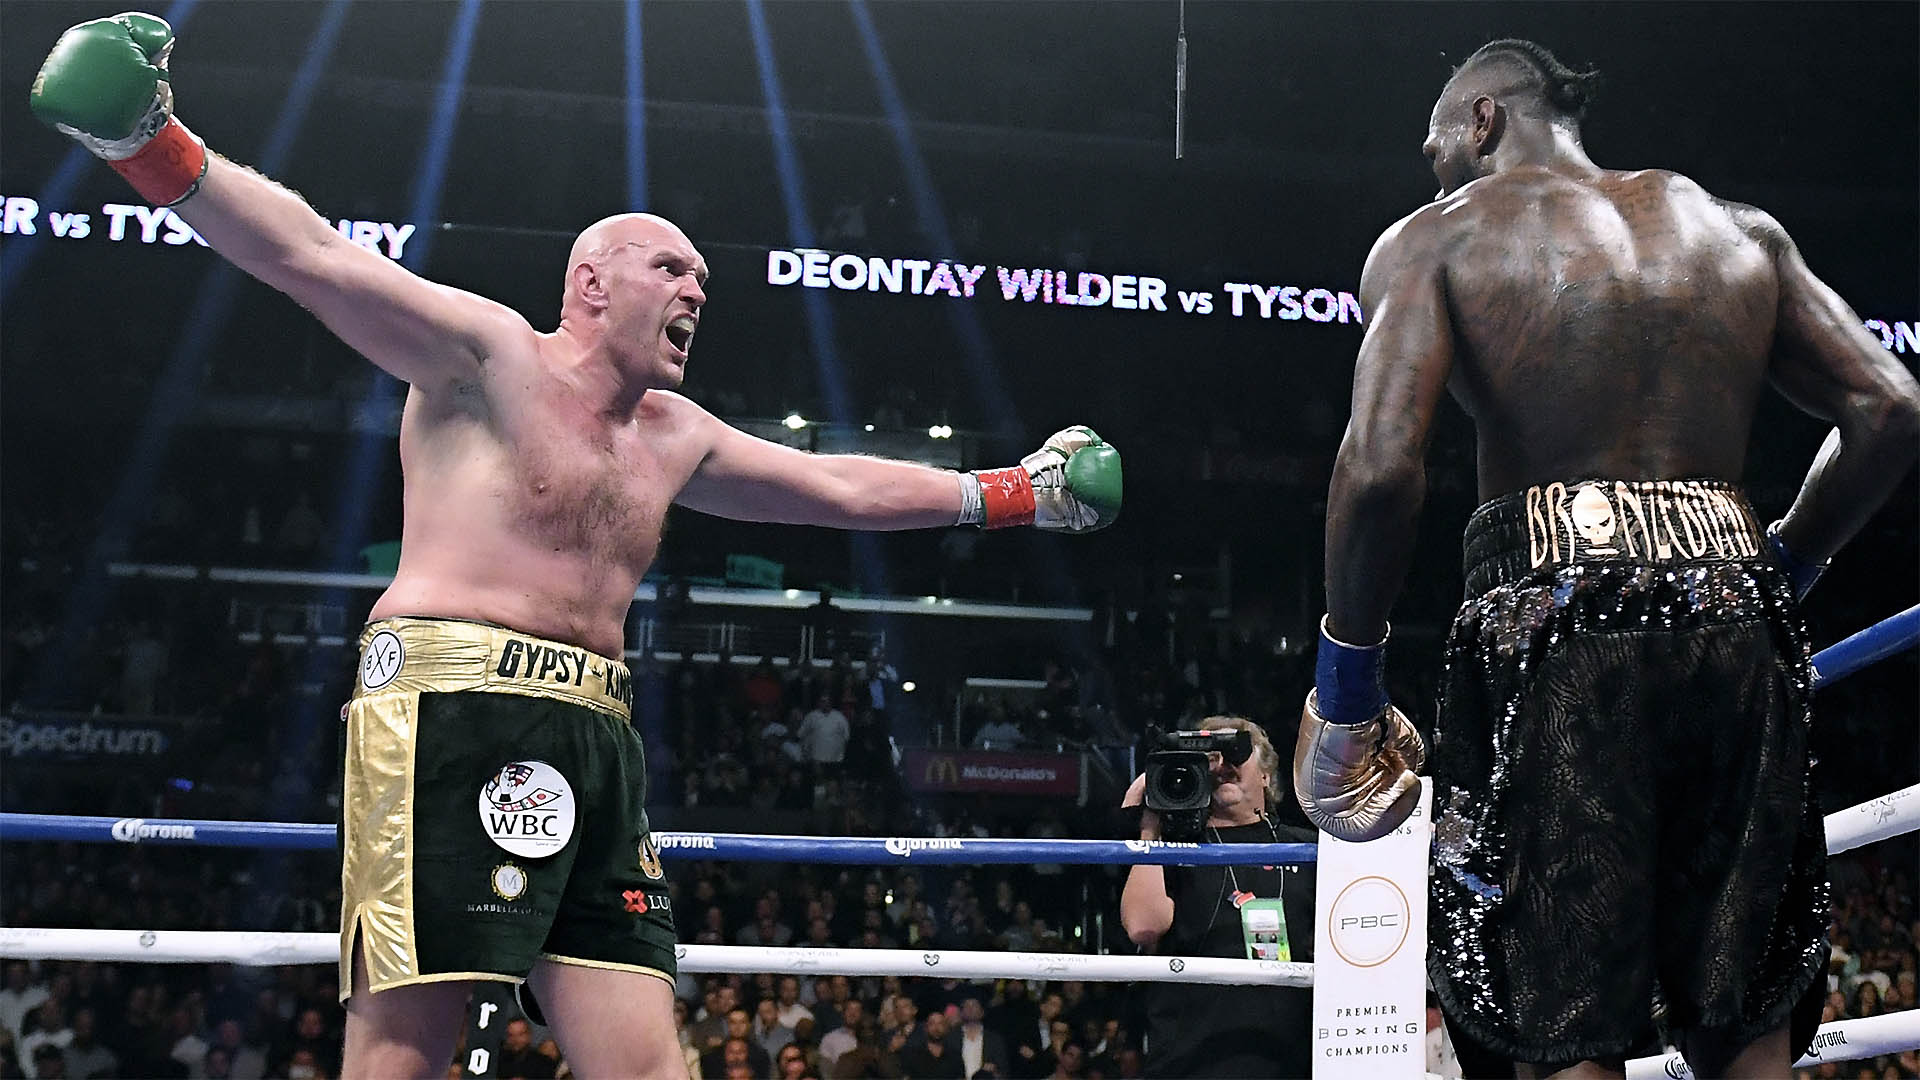 Tyson Fury vs. Anthony Joshua se complica tras fallo a favor de Deontay  Wilder - UNANIMO Deportes